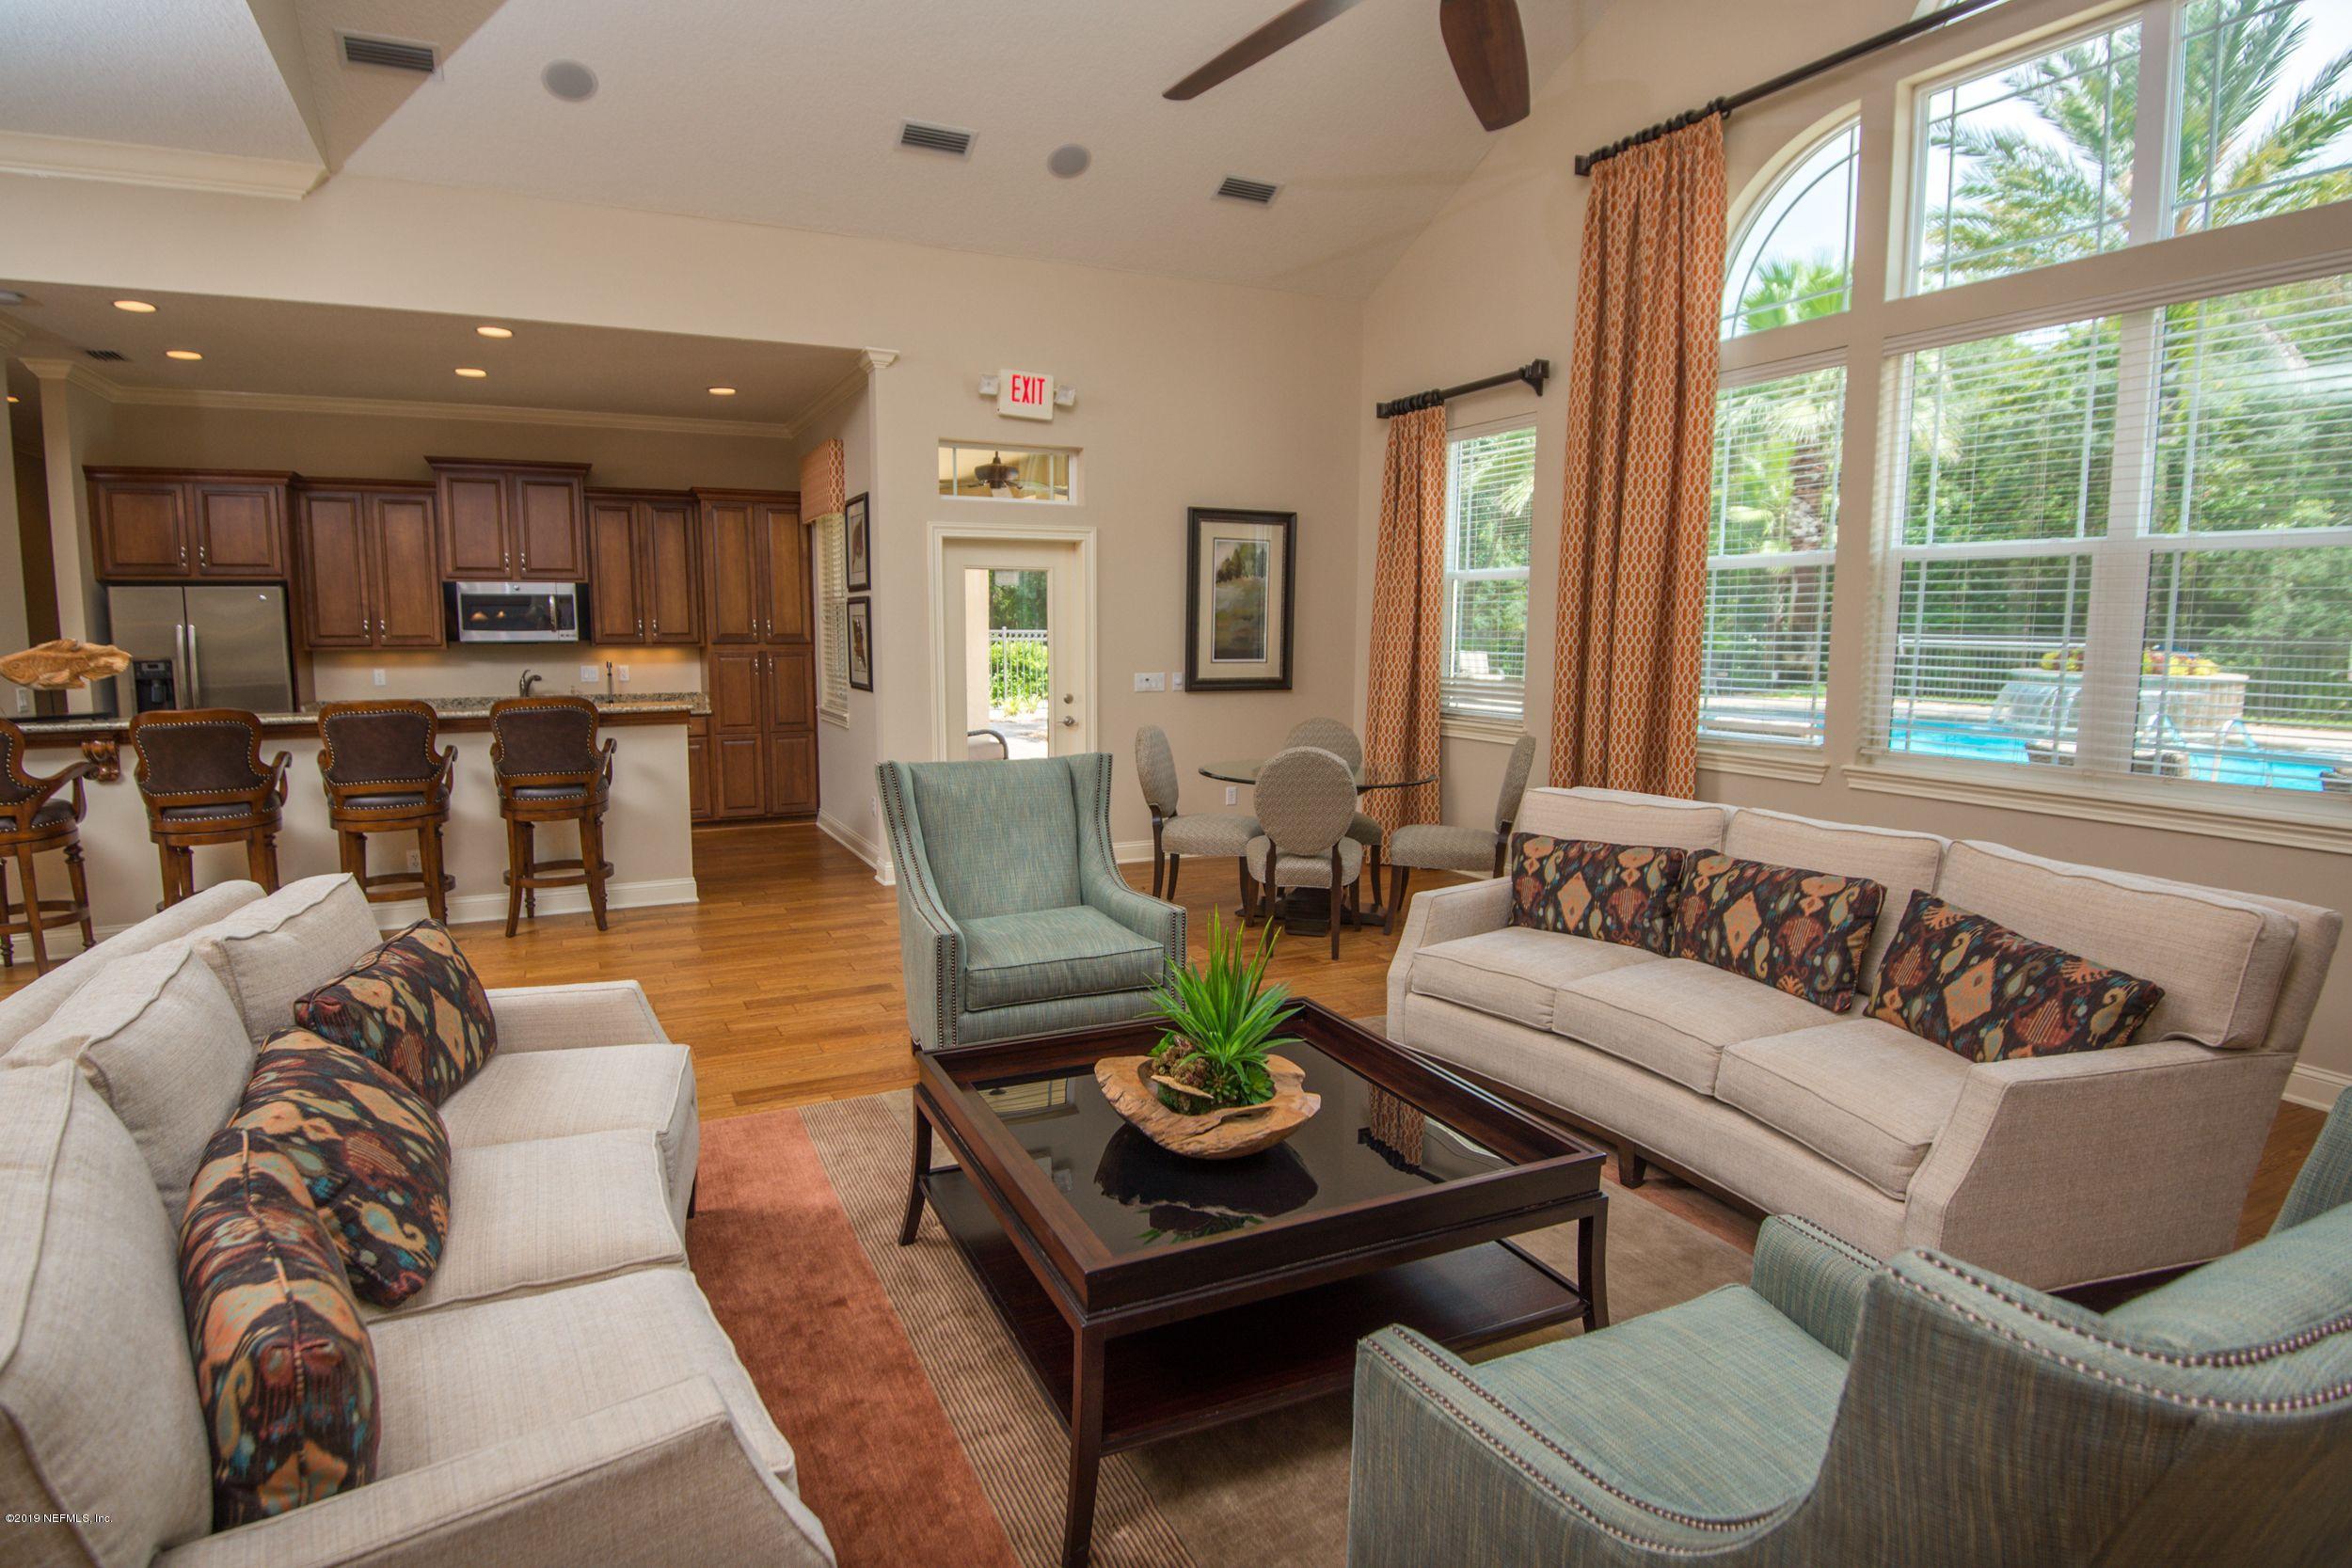 31 ANACAPA, ST AUGUSTINE, FLORIDA 32084, 2 Bedrooms Bedrooms, ,2 BathroomsBathrooms,Residential,For sale,ANACAPA,1031775